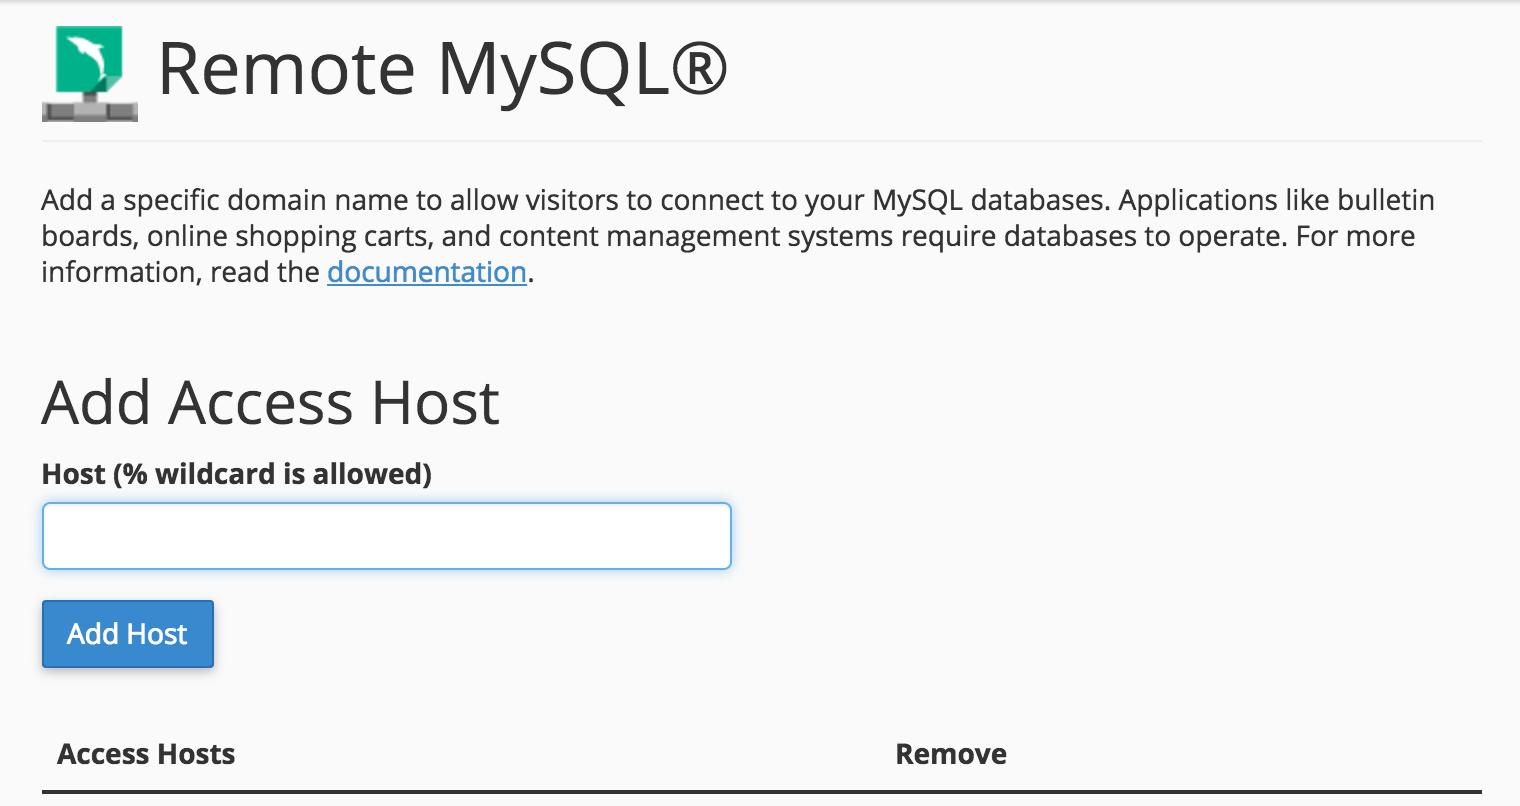 Remote MySQL